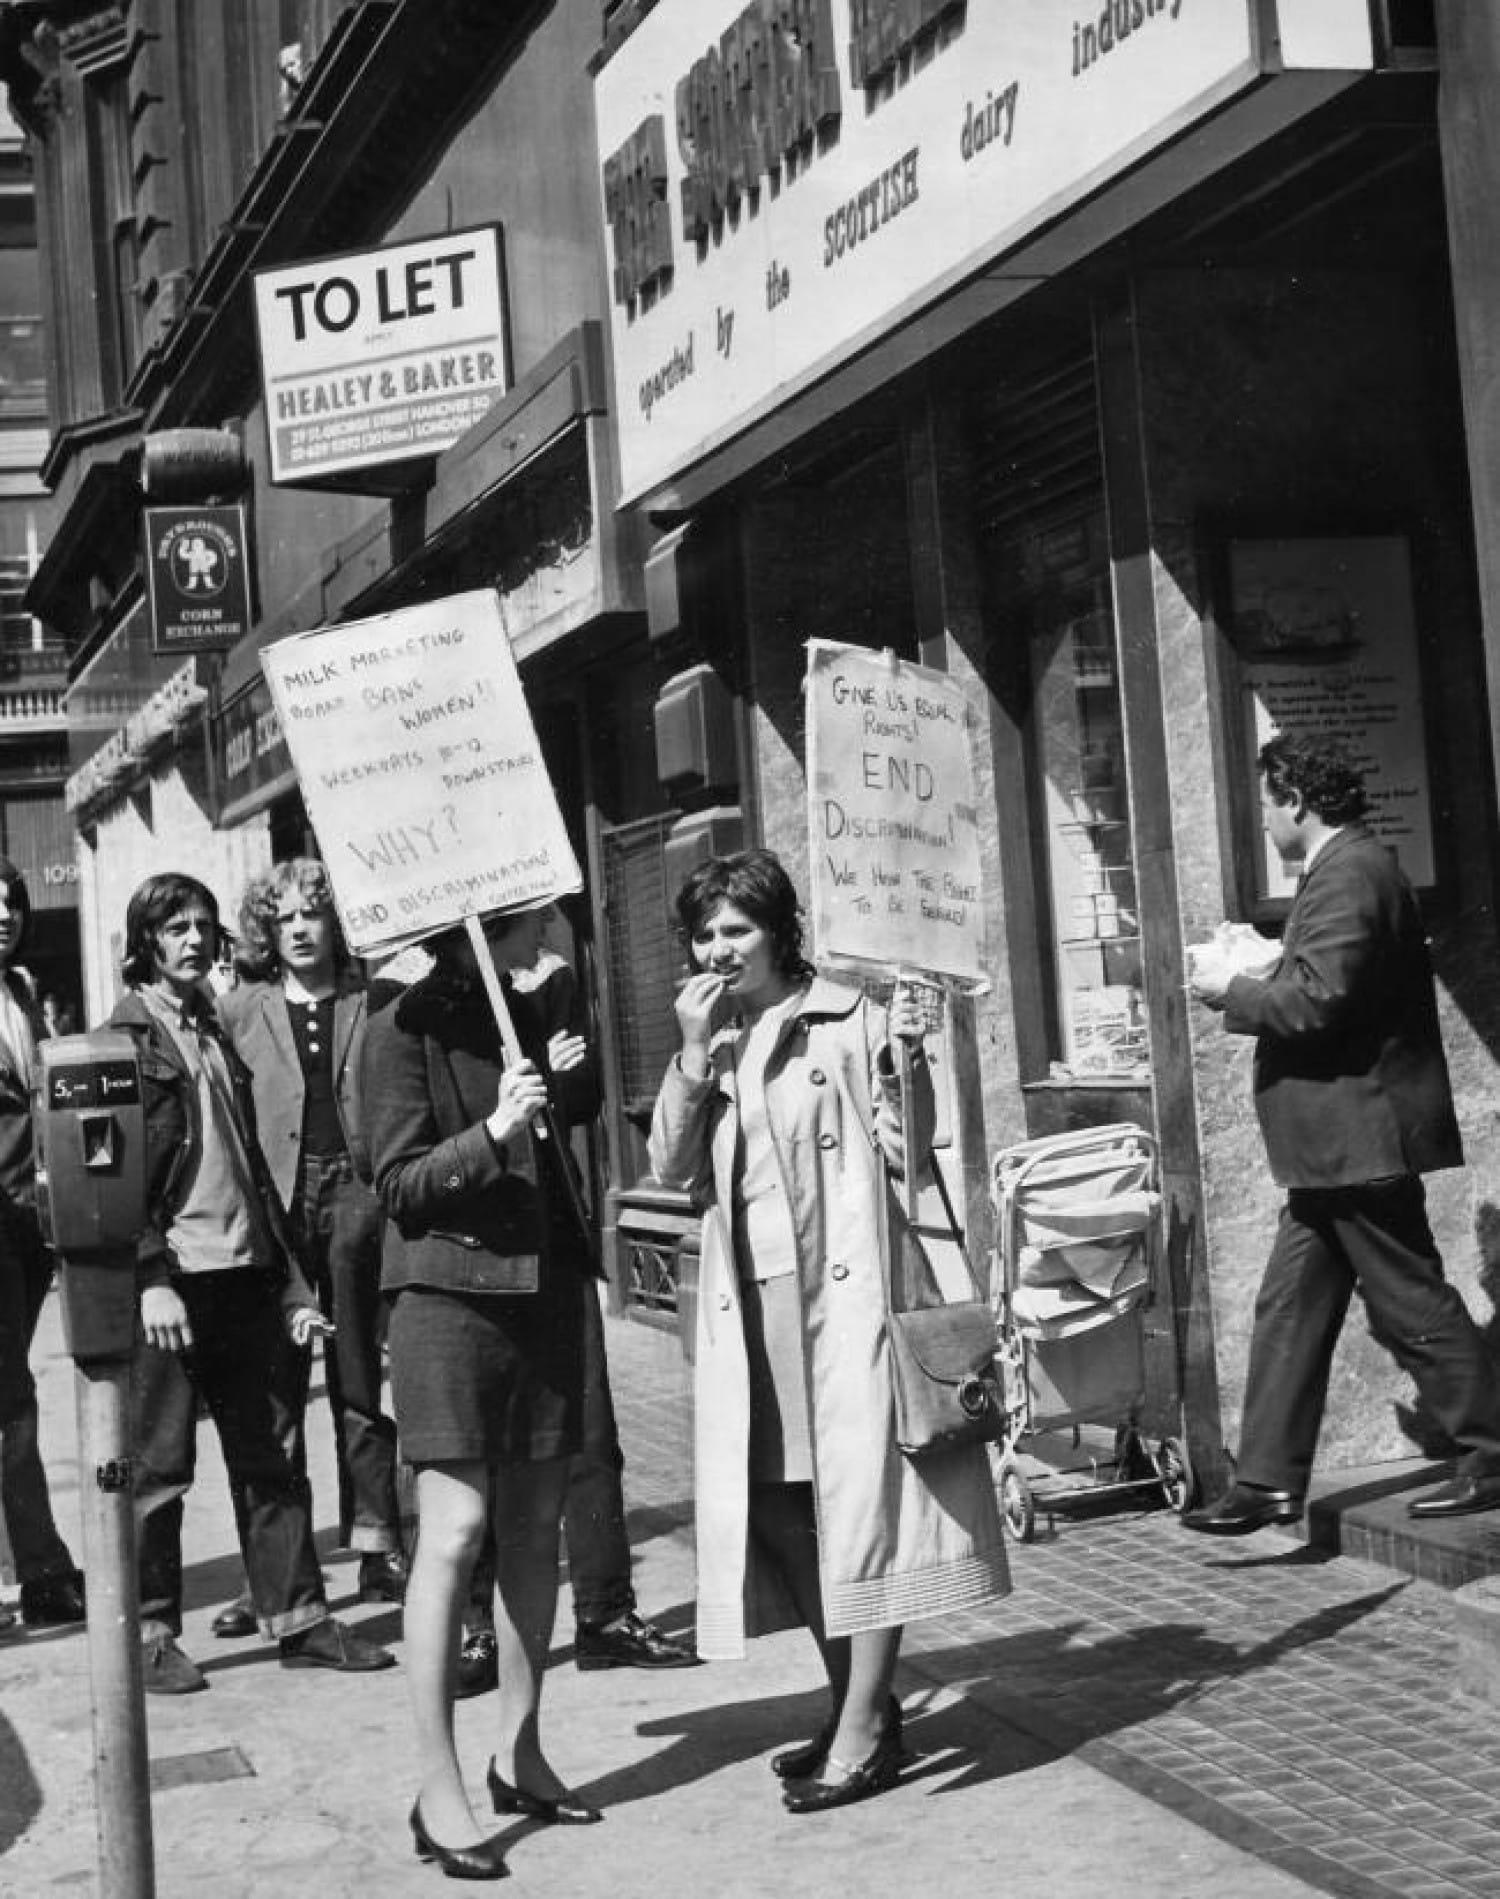 Protest outside the Gordon Street Milk Bar, 1971 (Newsquest Media Group)